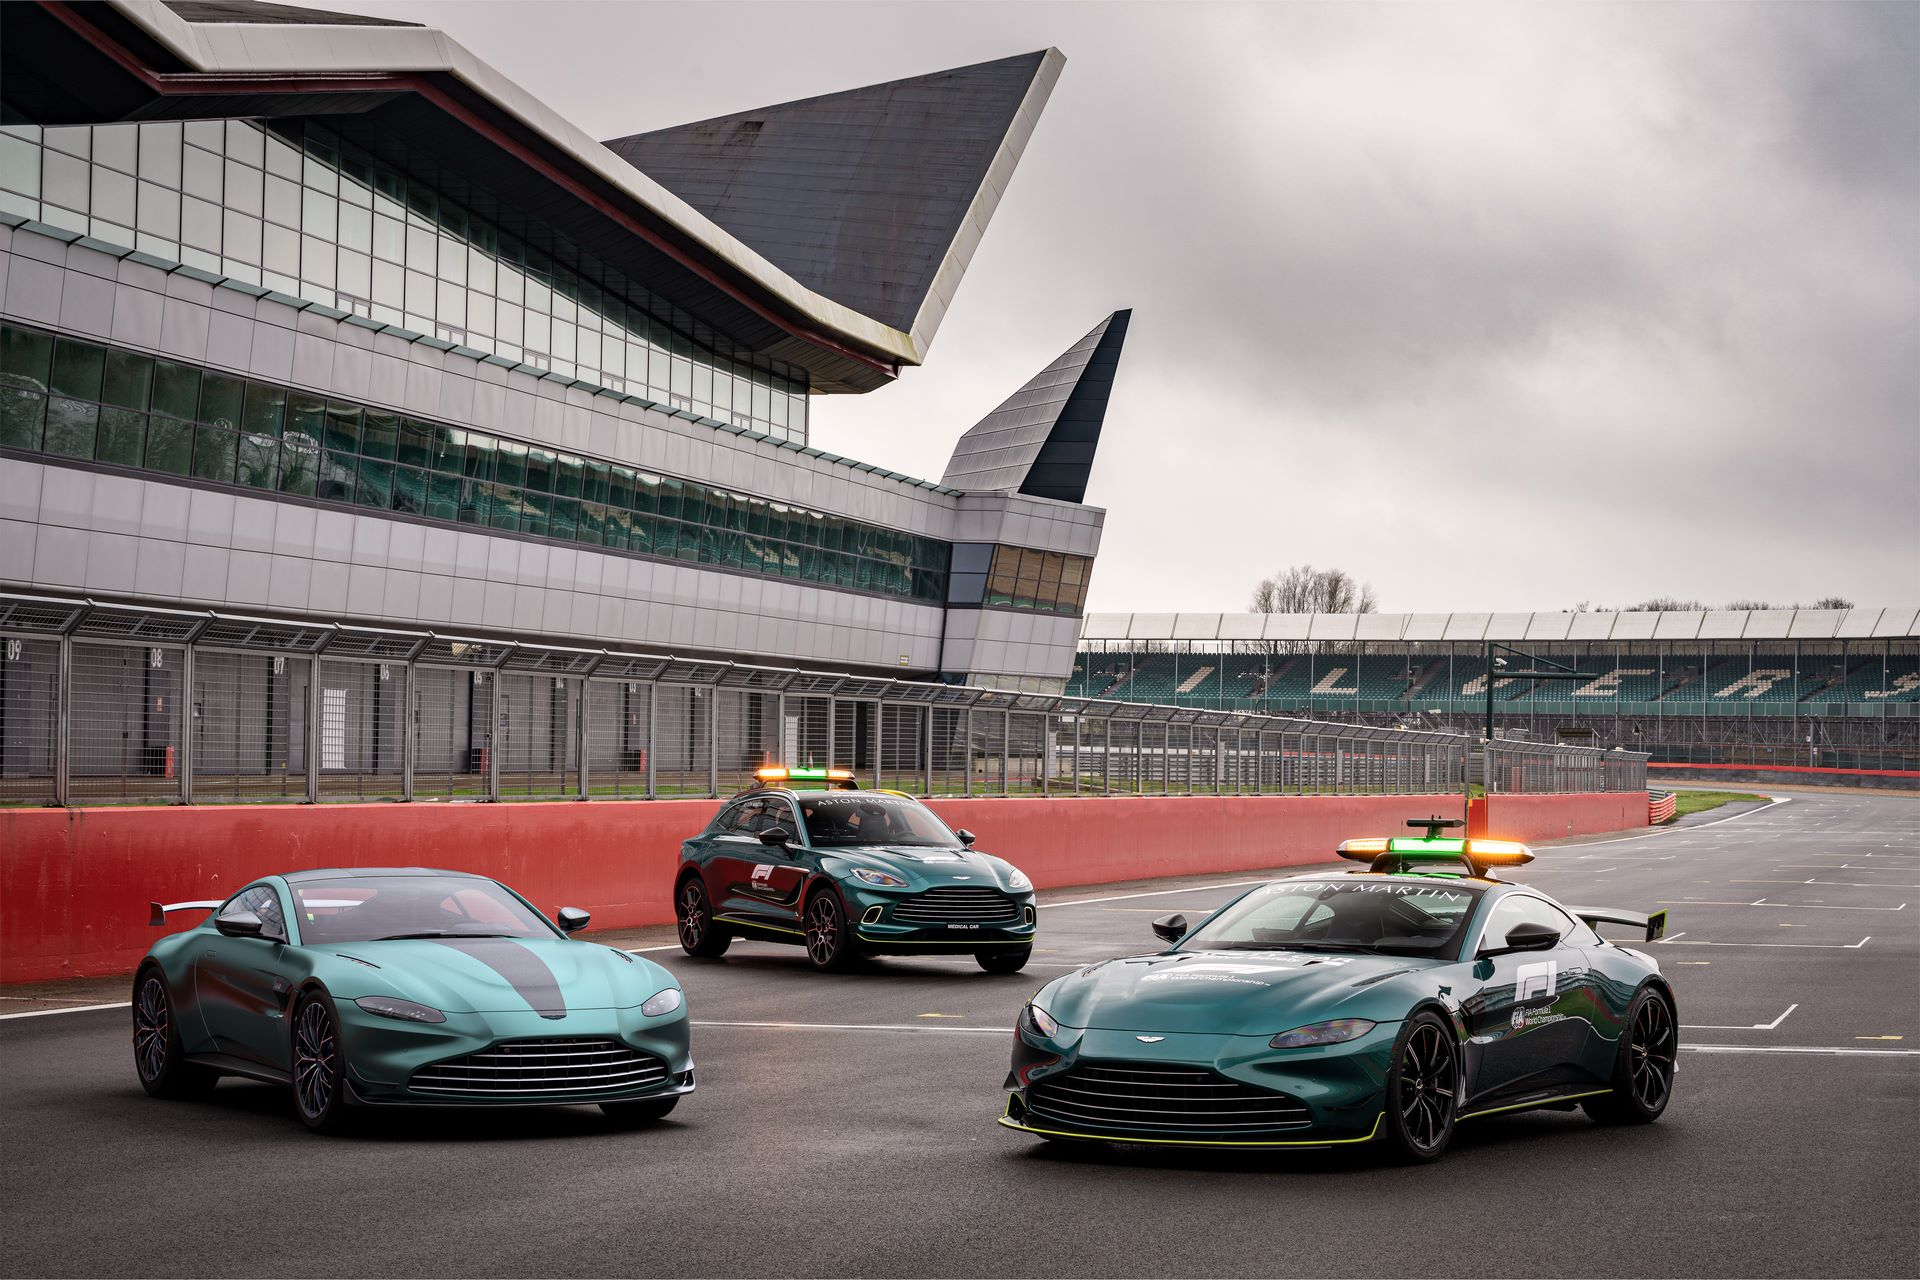 Aston-Martin-Vantage-F1-Edition-10